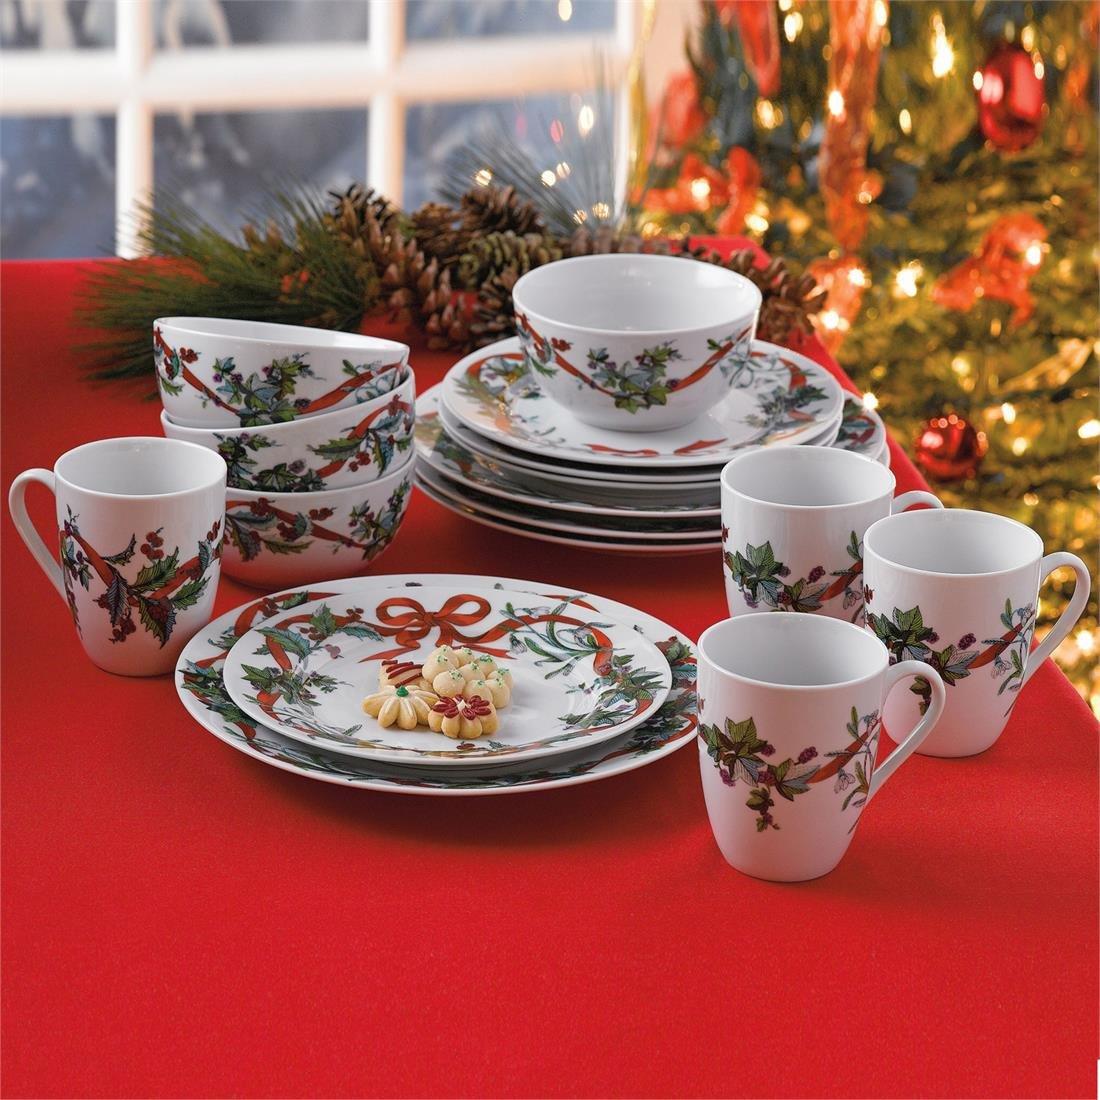 Brylanehome 16-Pc. Christmas Dinnerware Set (White,0)